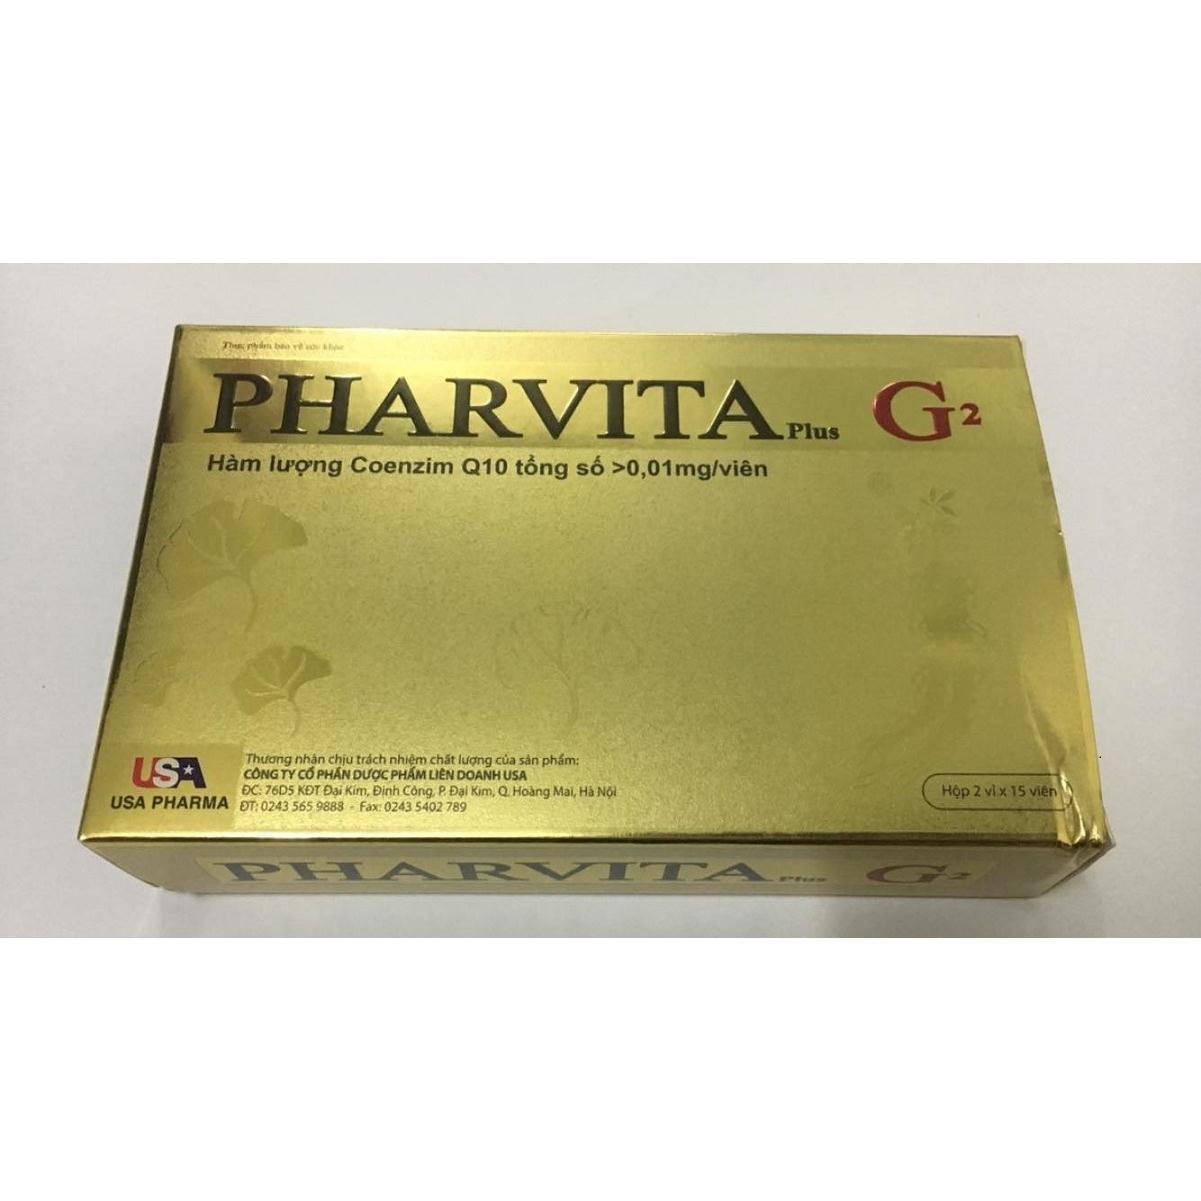 Pharvita Plus G2